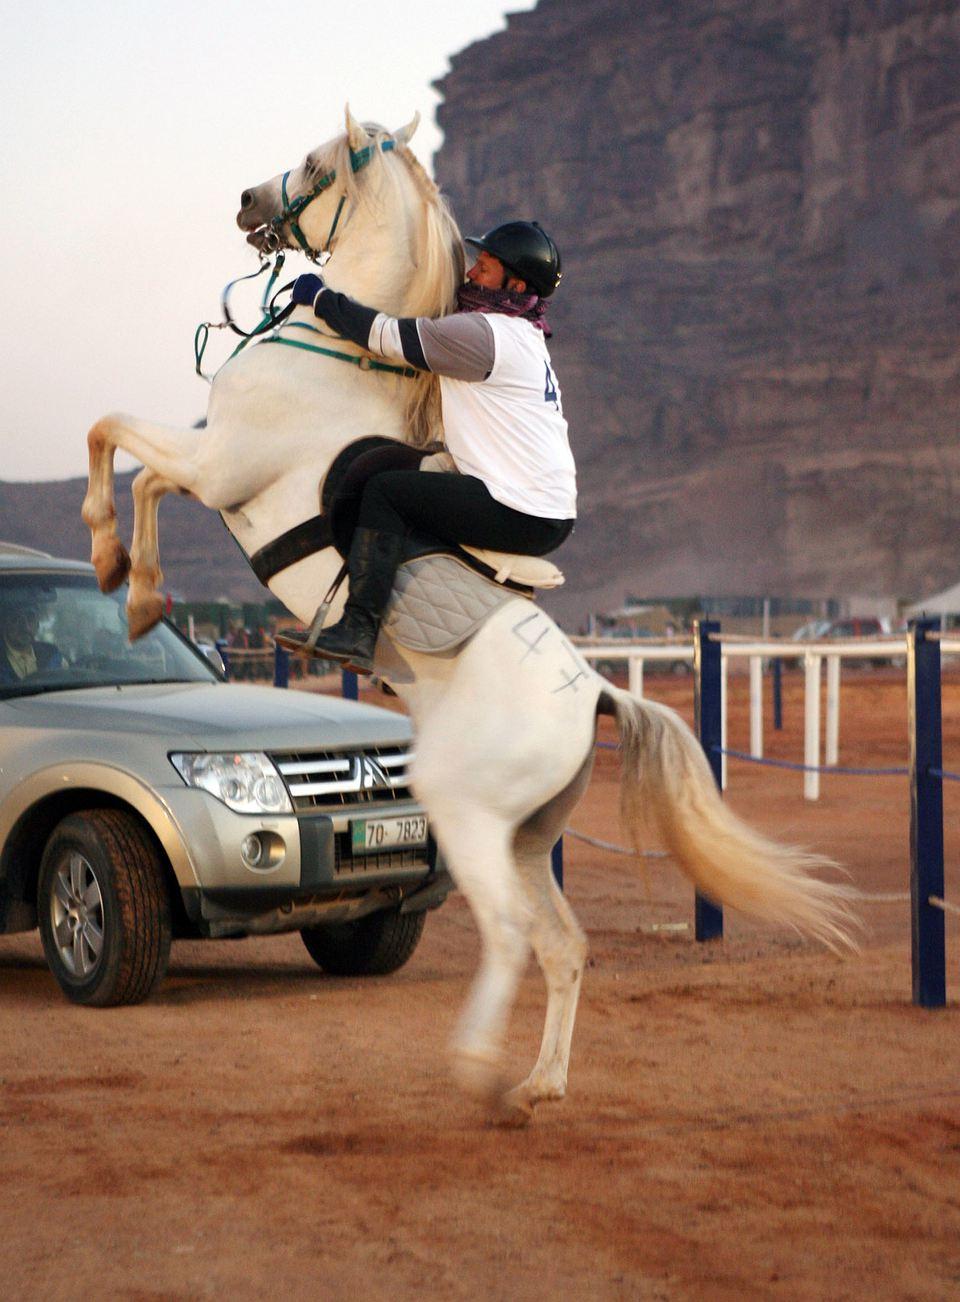 A jockey on a rearing horse